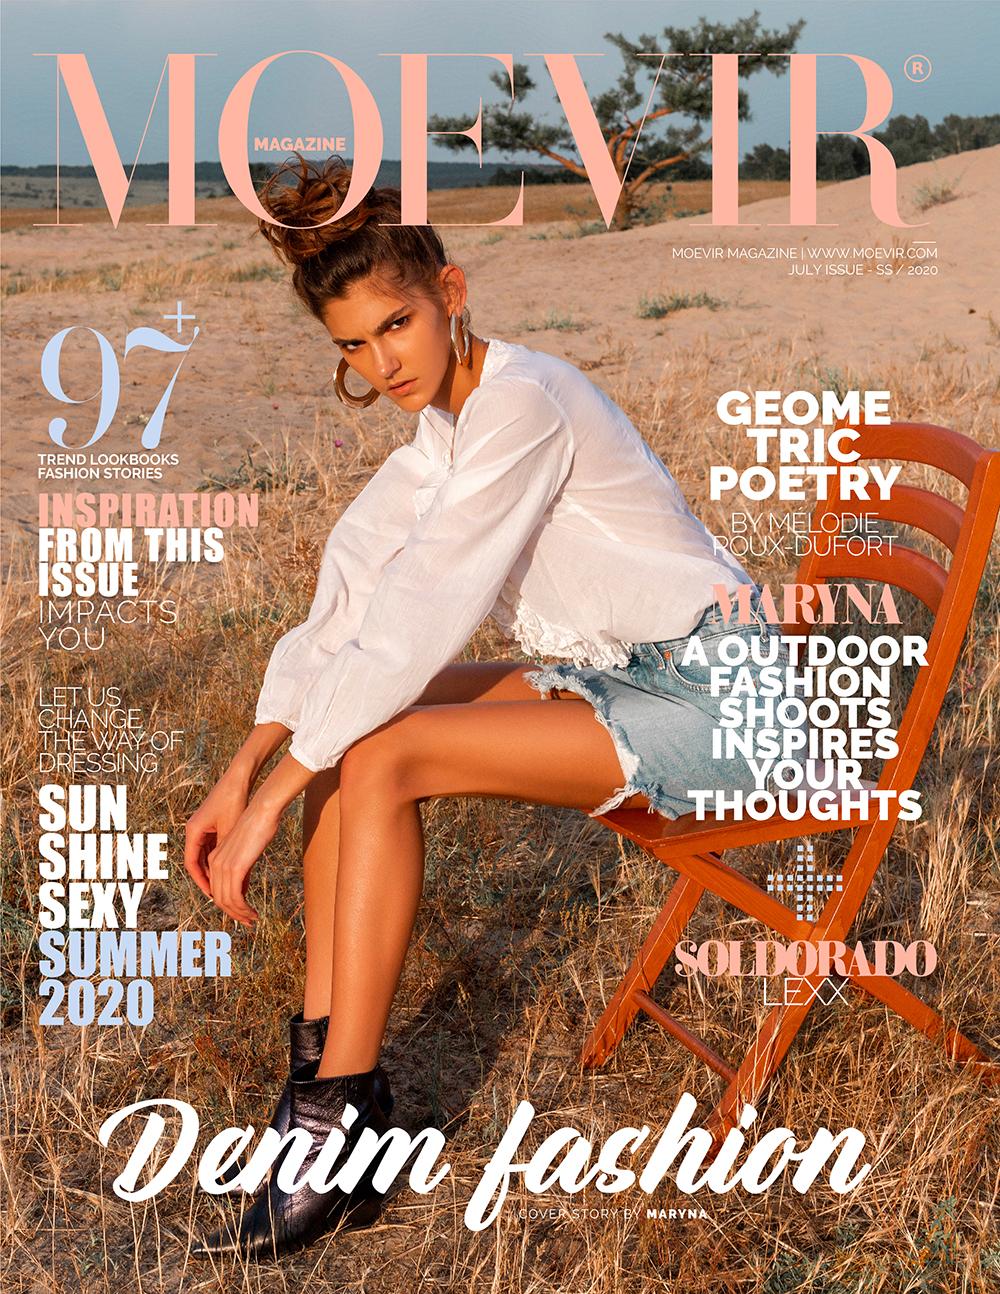 Moevir Magazine July Issue